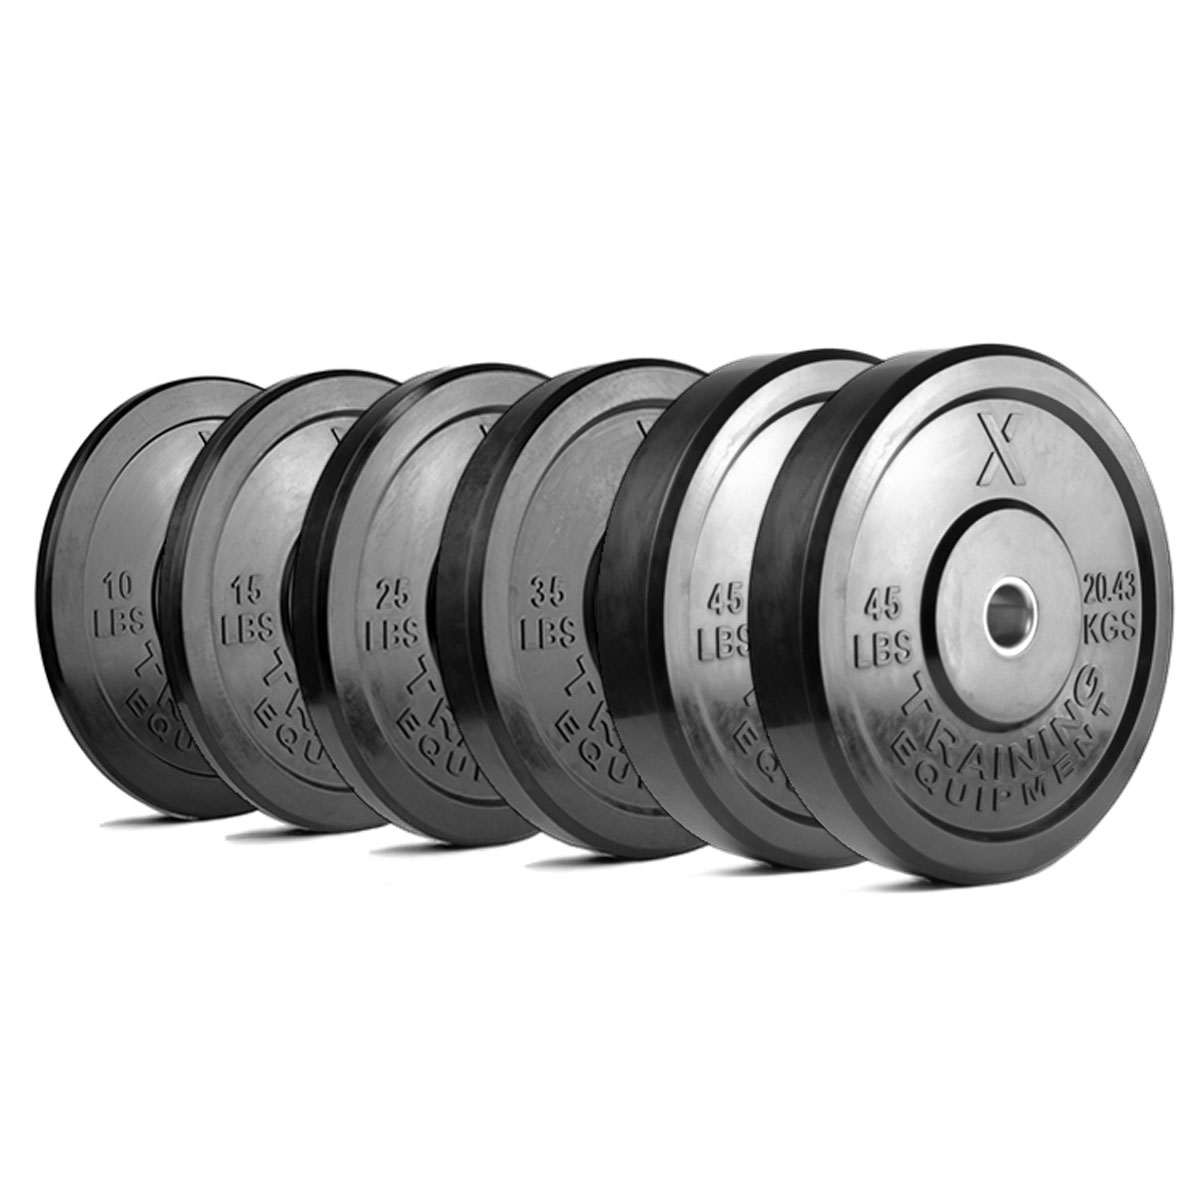 Premium Black Bumper Plates and Sets